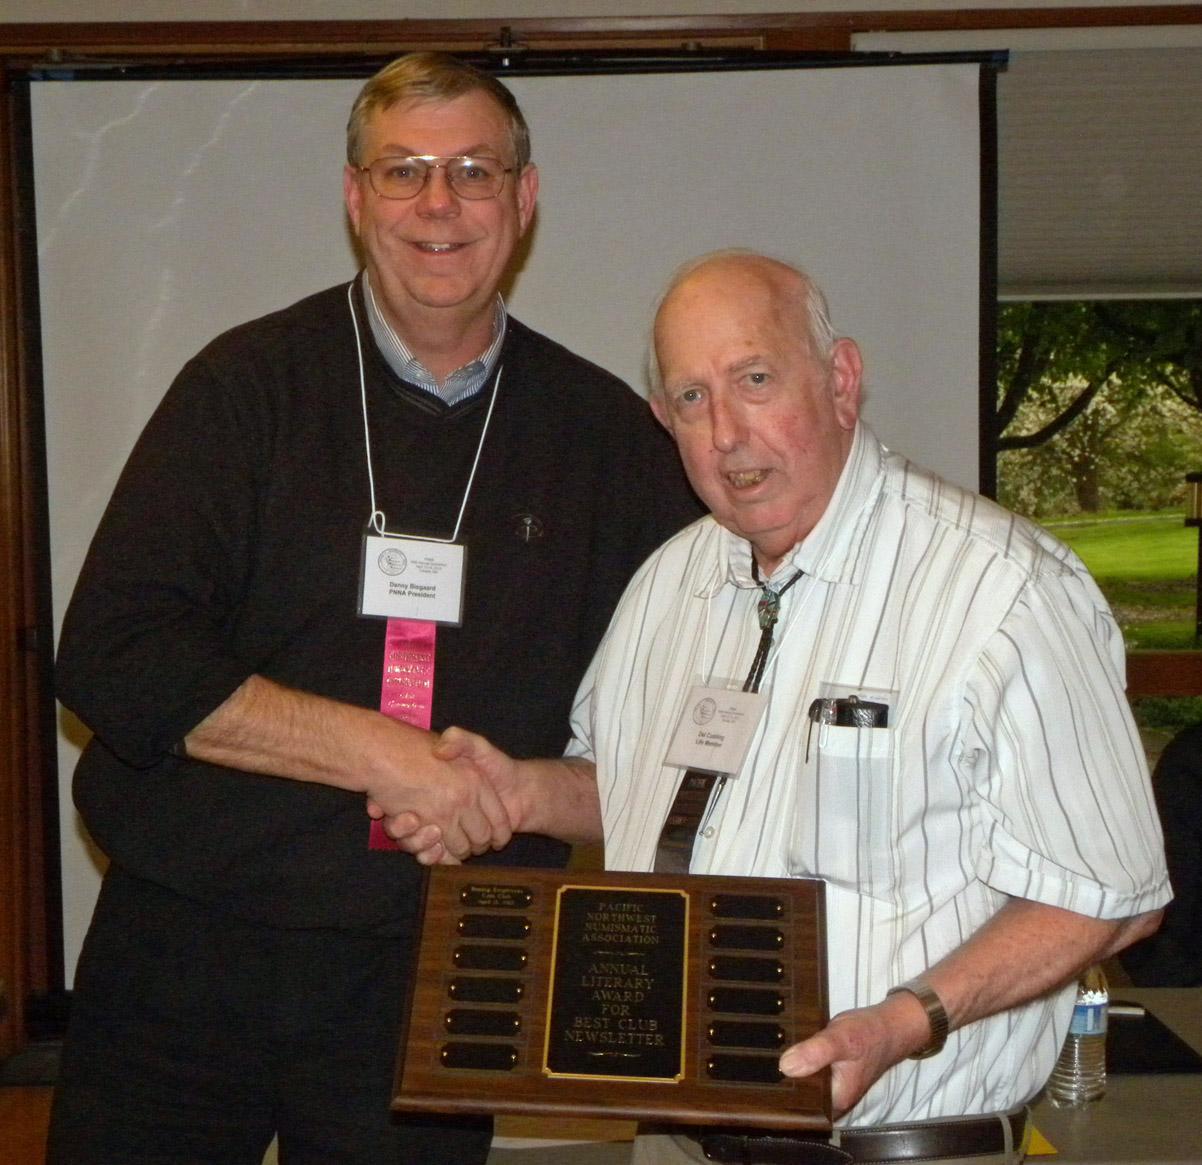 Del Cushing/BECC - 2013 literary award for club newsletter